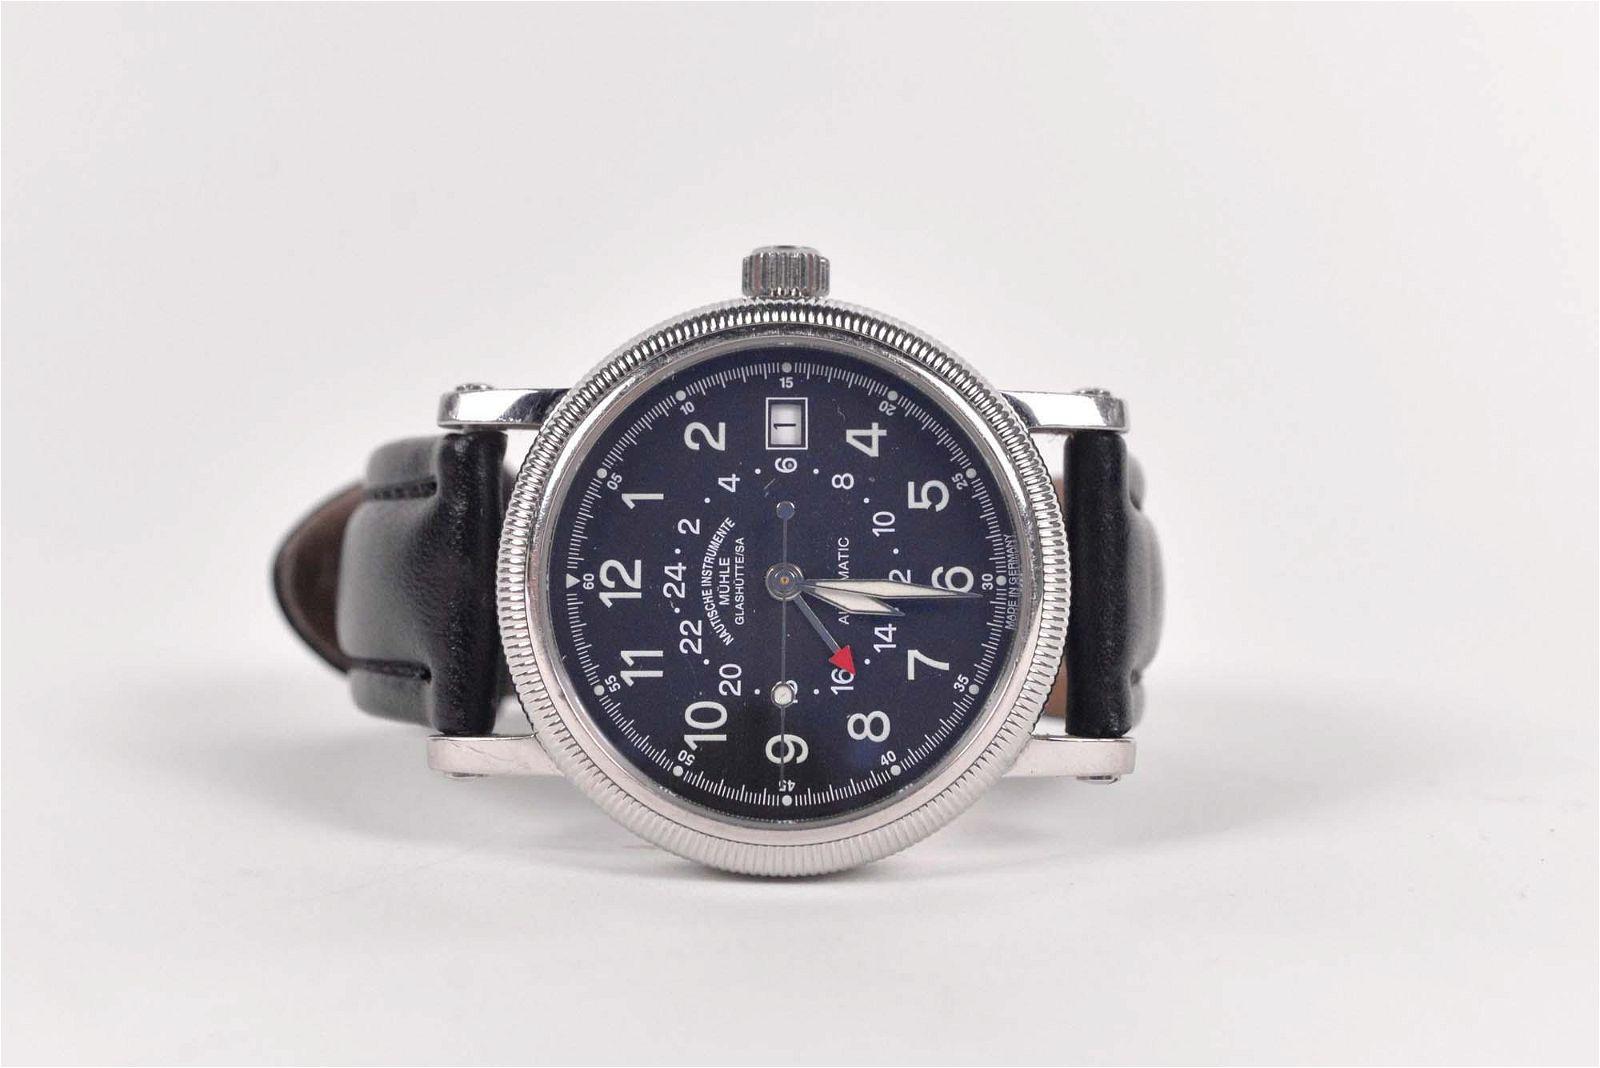 Mühle - Men's chronograph watch